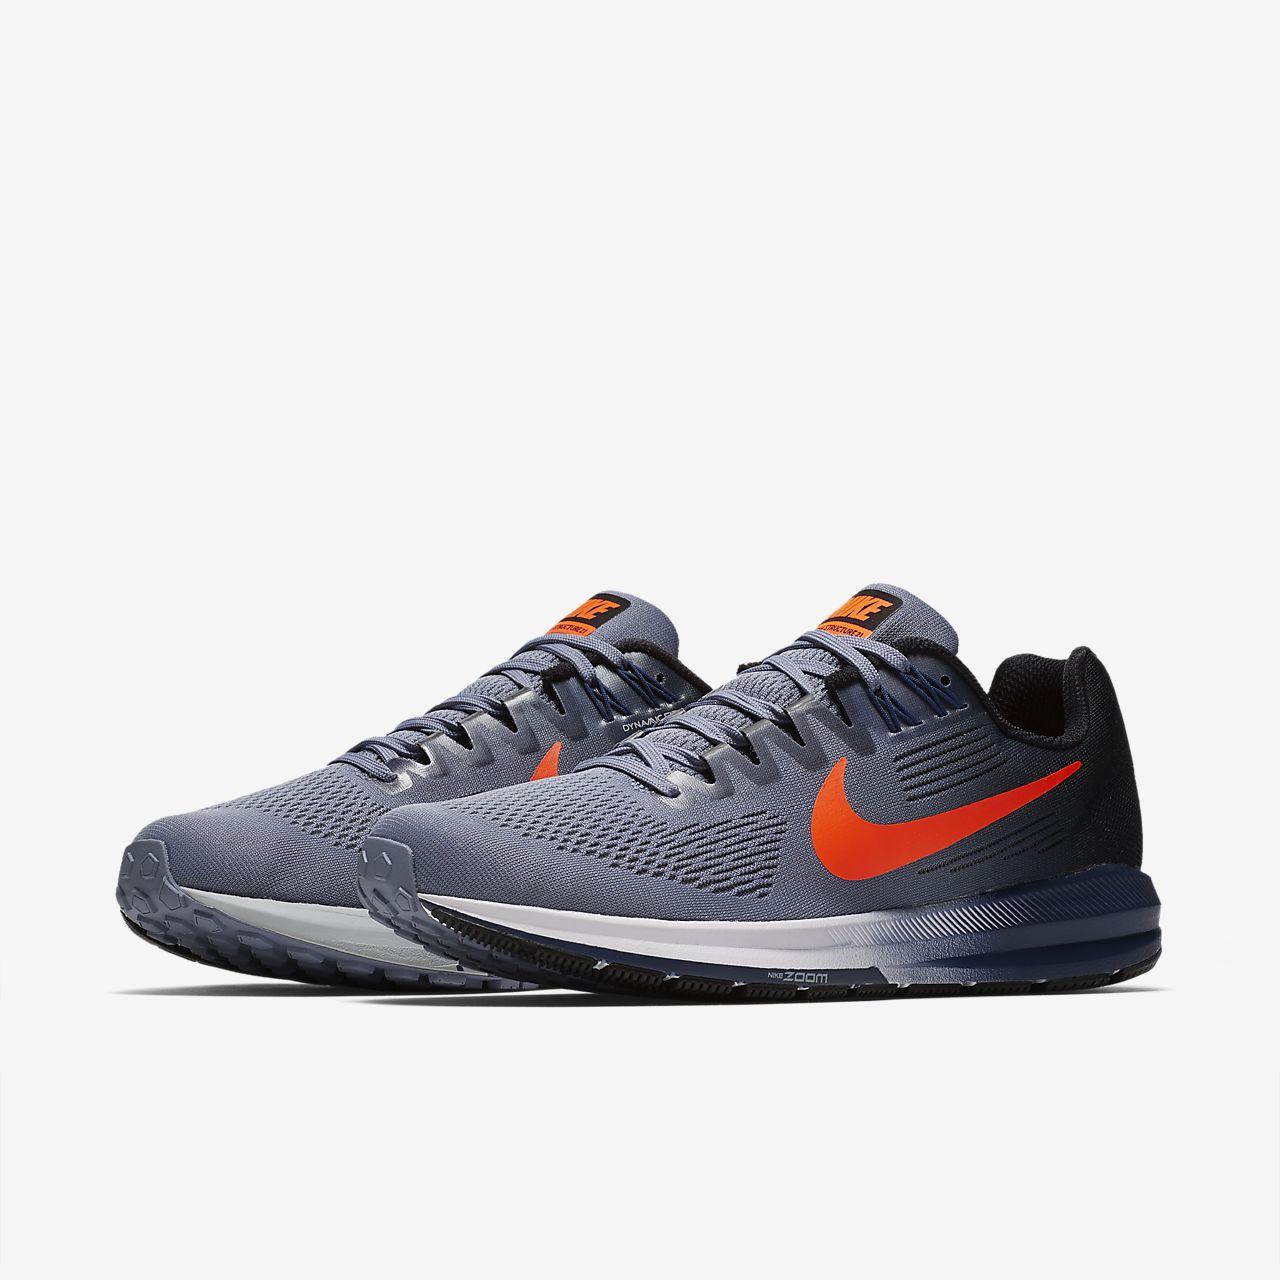 Nike Nike Air De Securite Securite Chaussure De Chaussure qUSVpzM